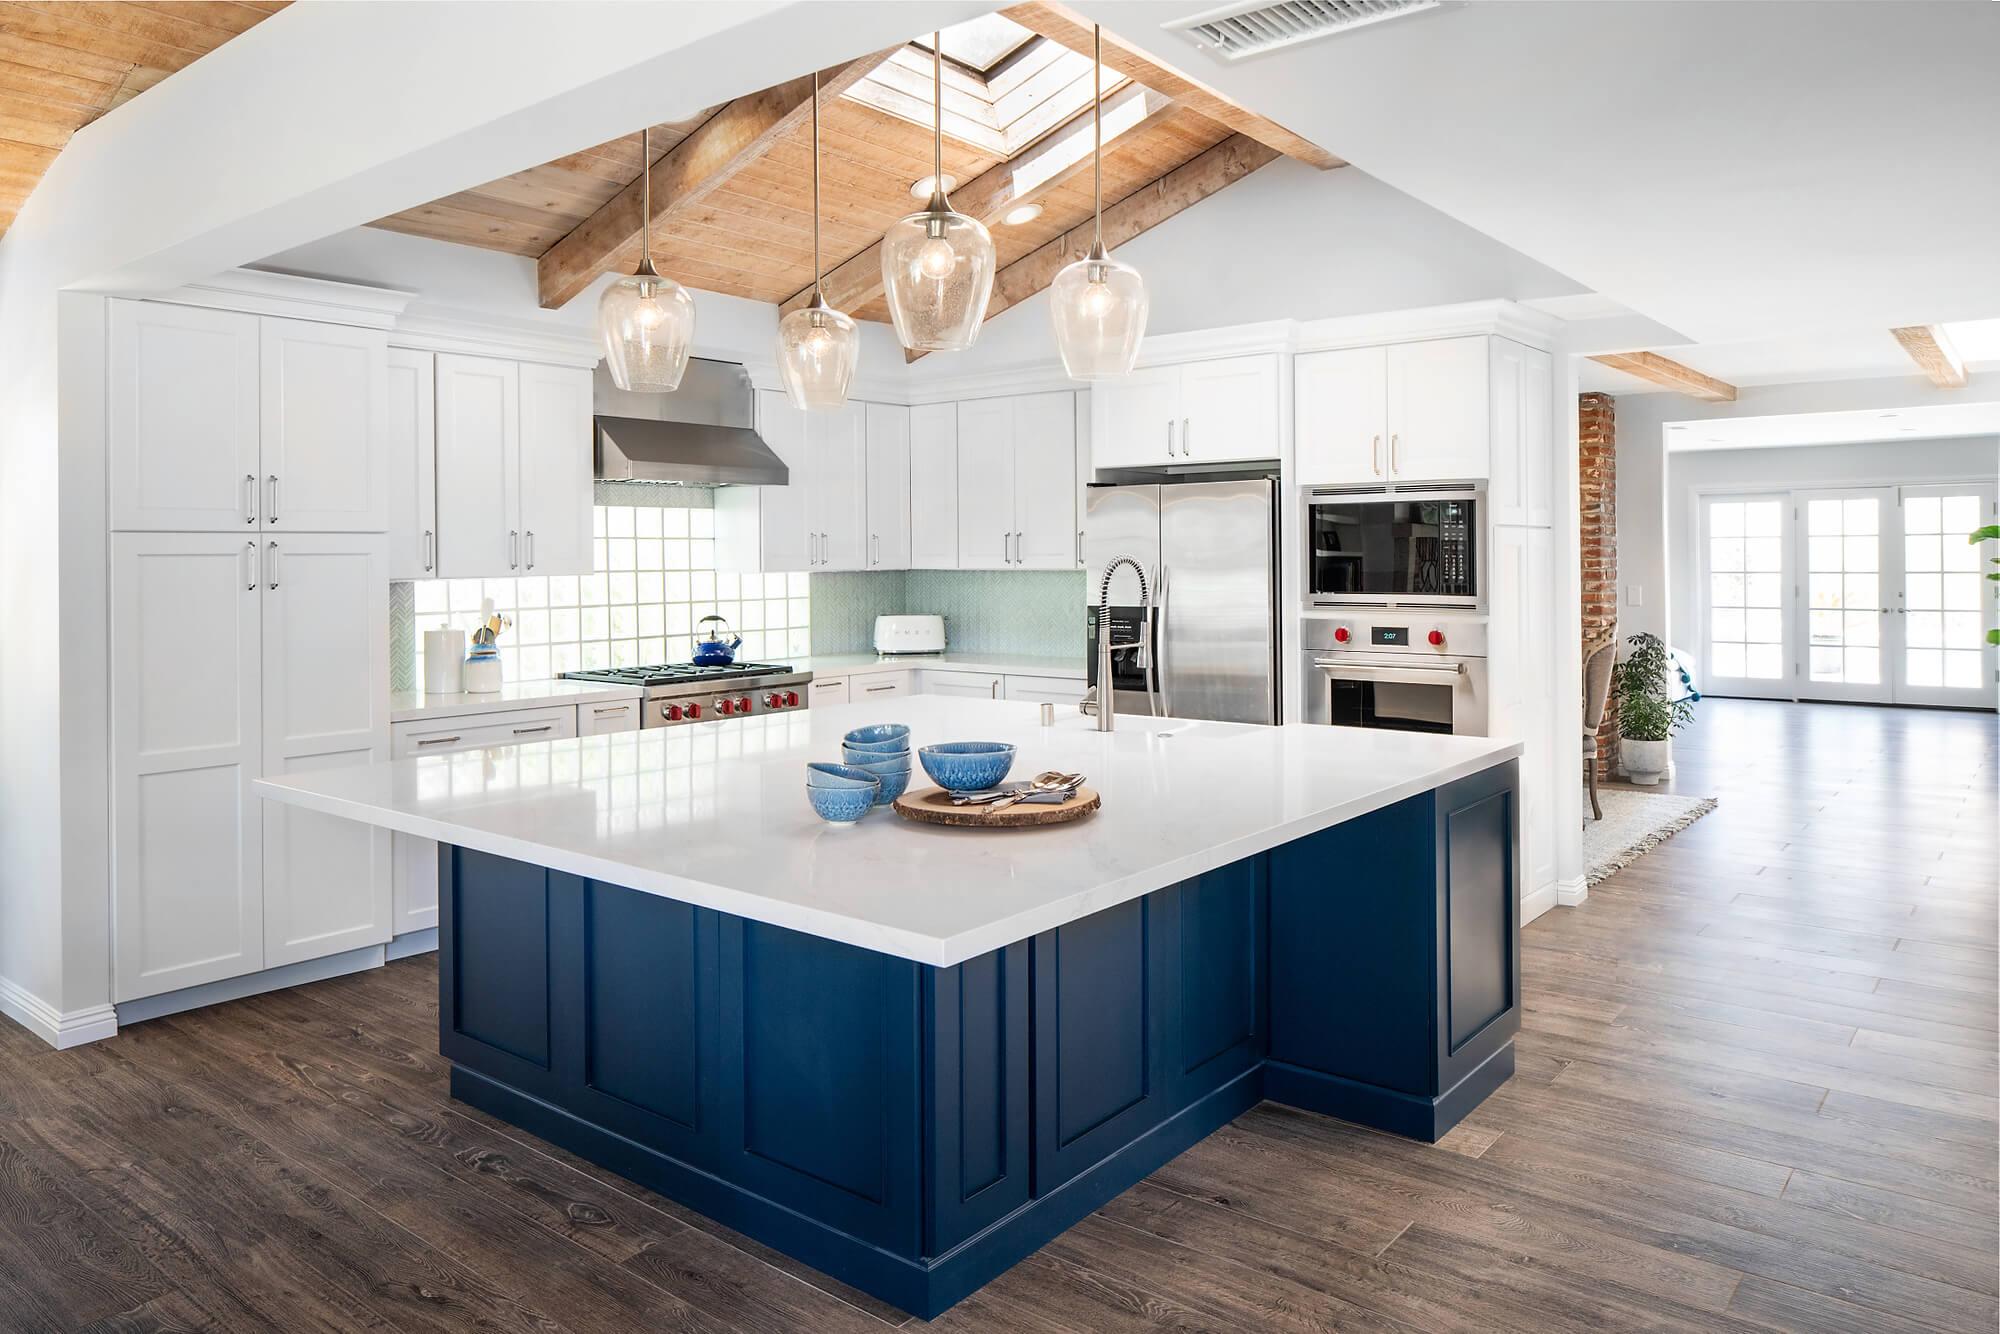 Blue Kitchen Designs are In